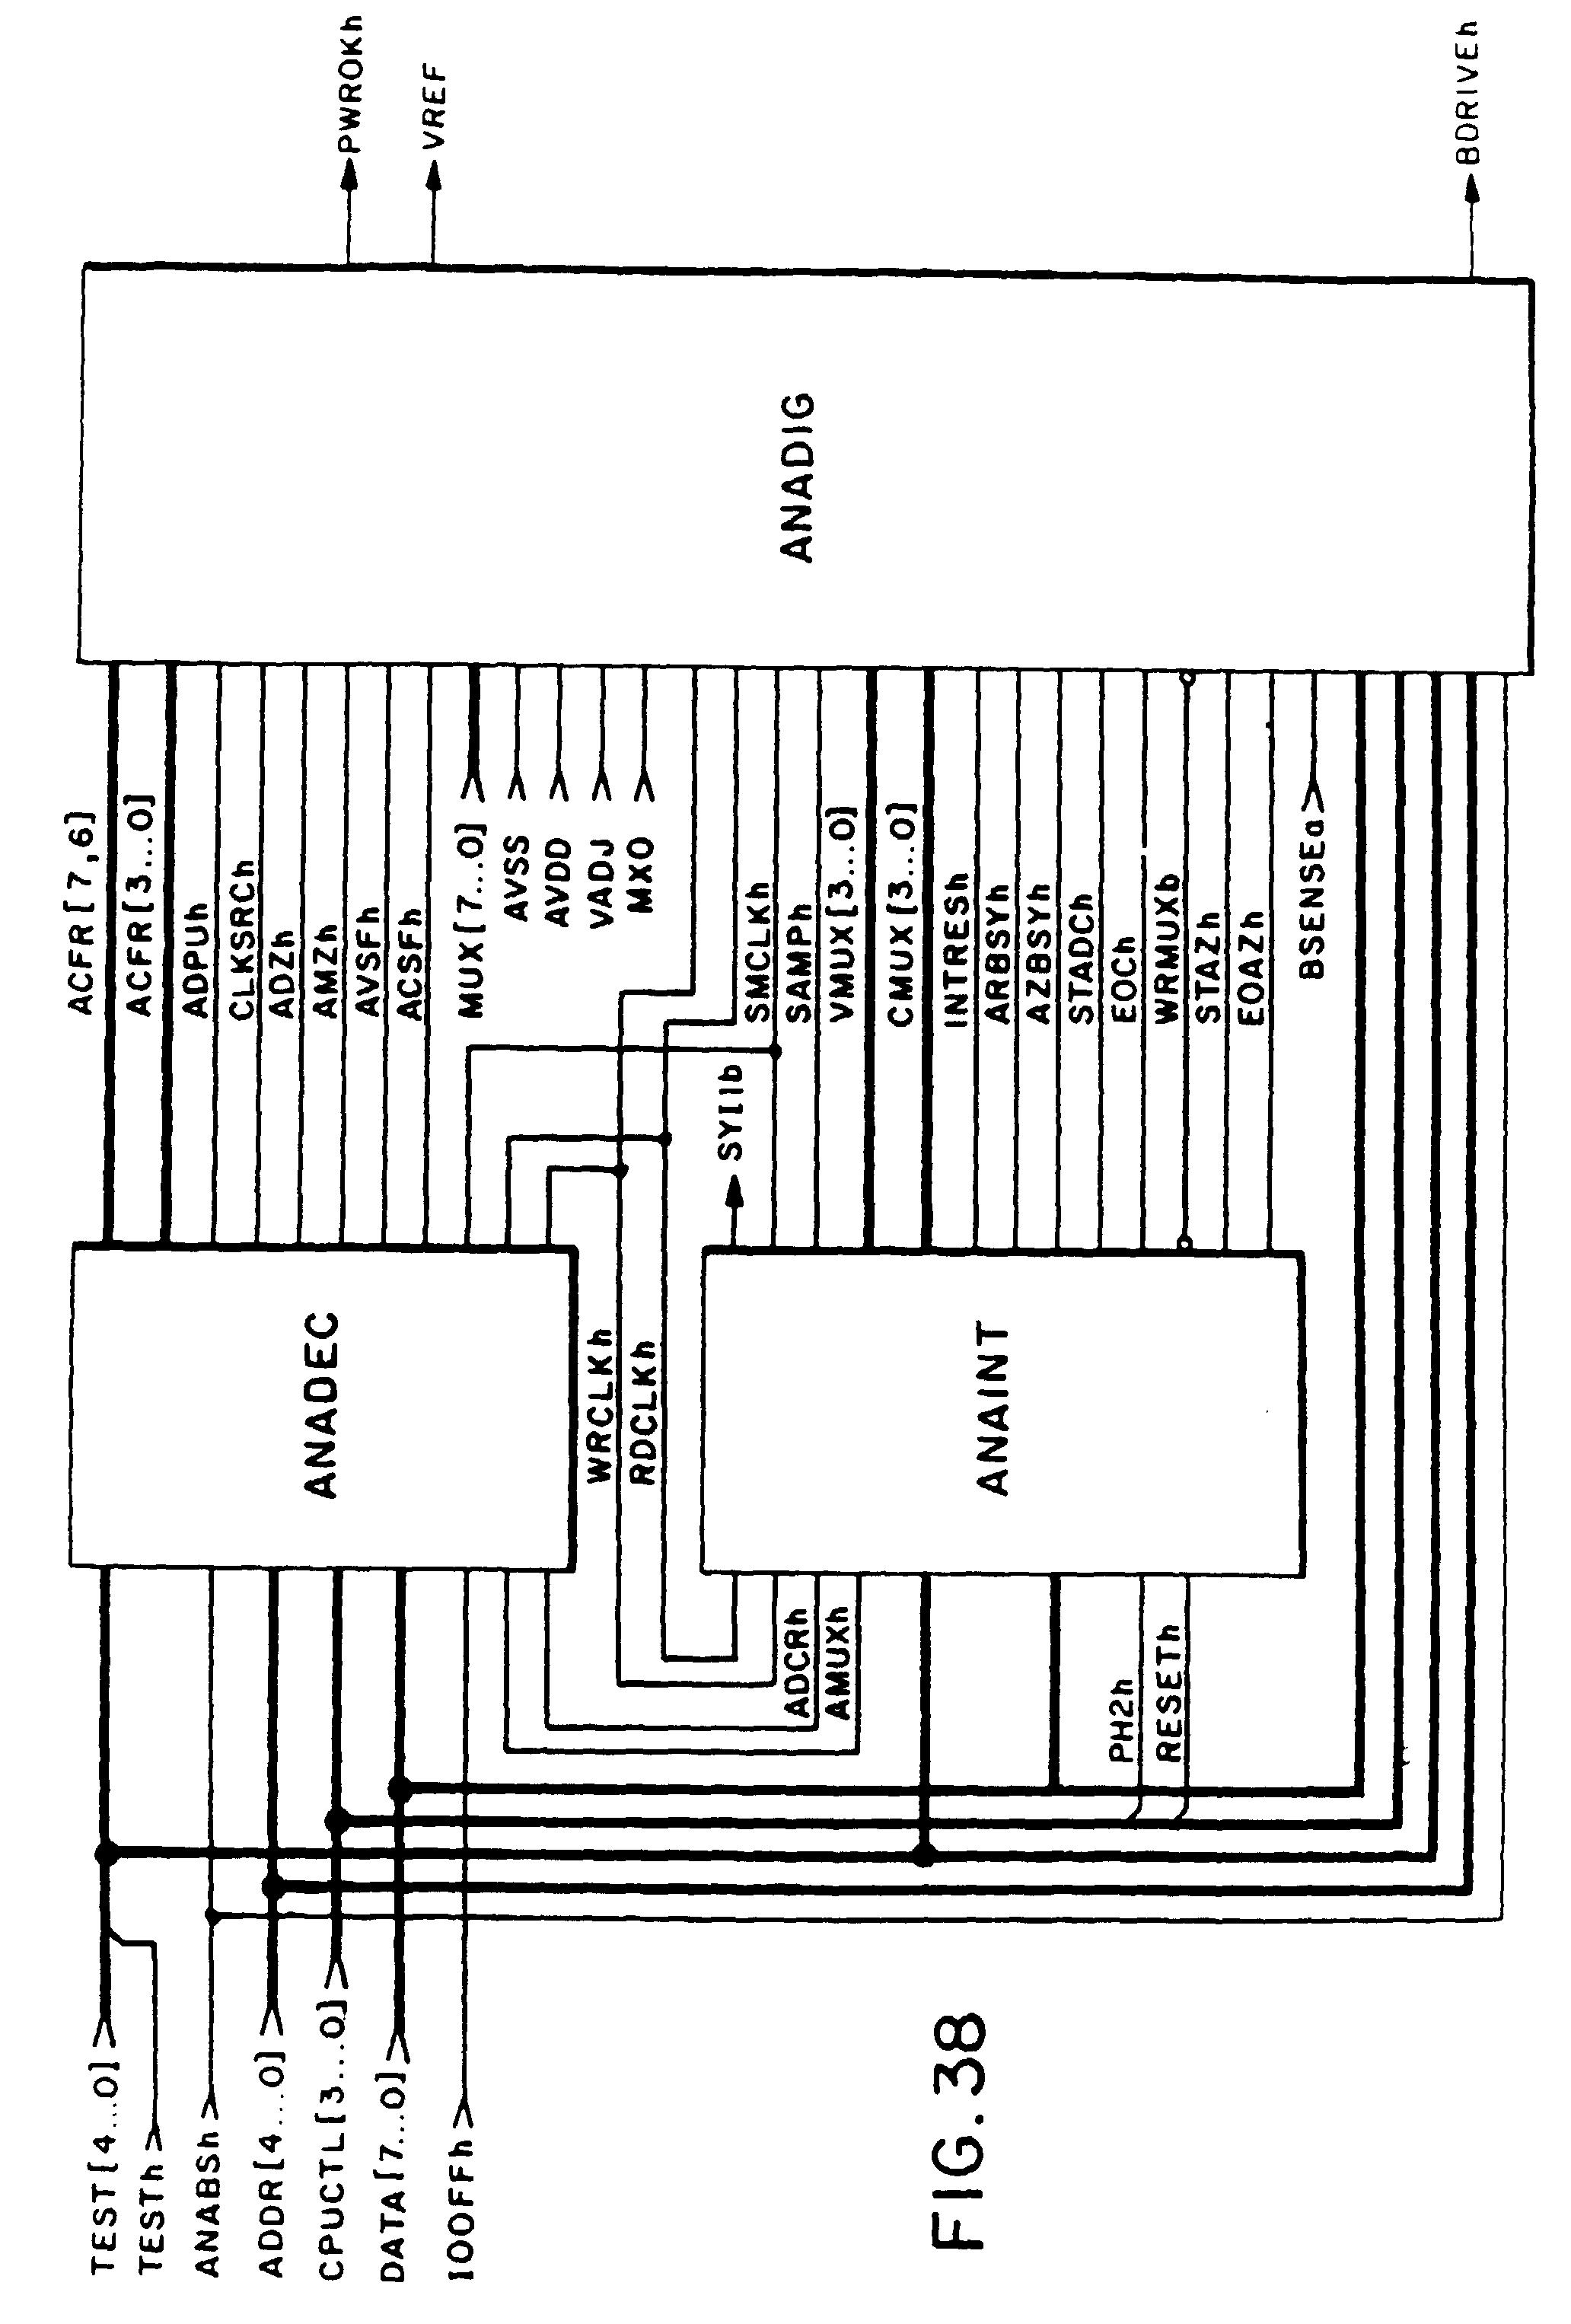 Perfect Astone Power Supply Unit Model Atx P200 W Schematics Diagram ...